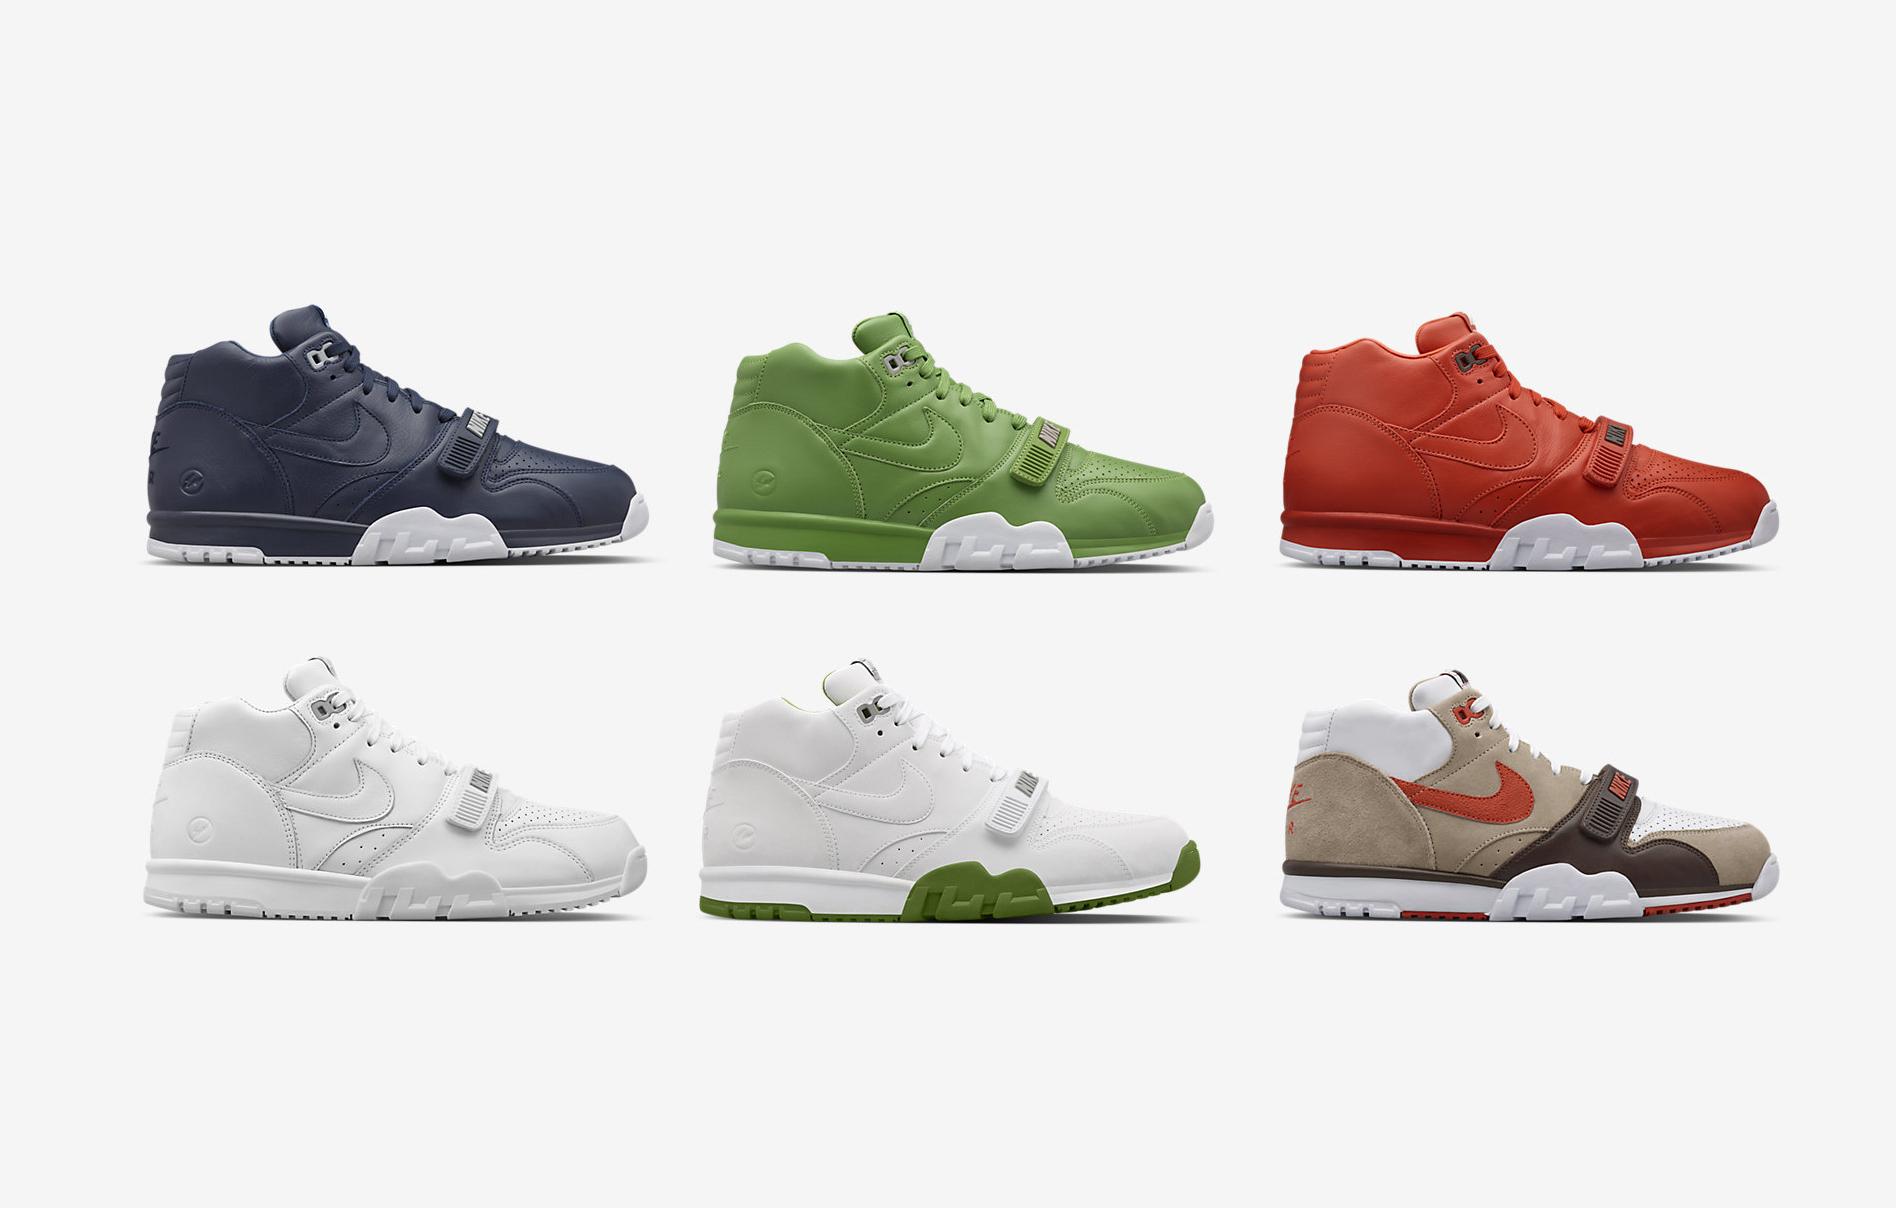 buy popular 9c539 4ce35 Kicks Off Court   Lifestyle   Nike   Retro Lifestyle   Trainers    August 27  ...